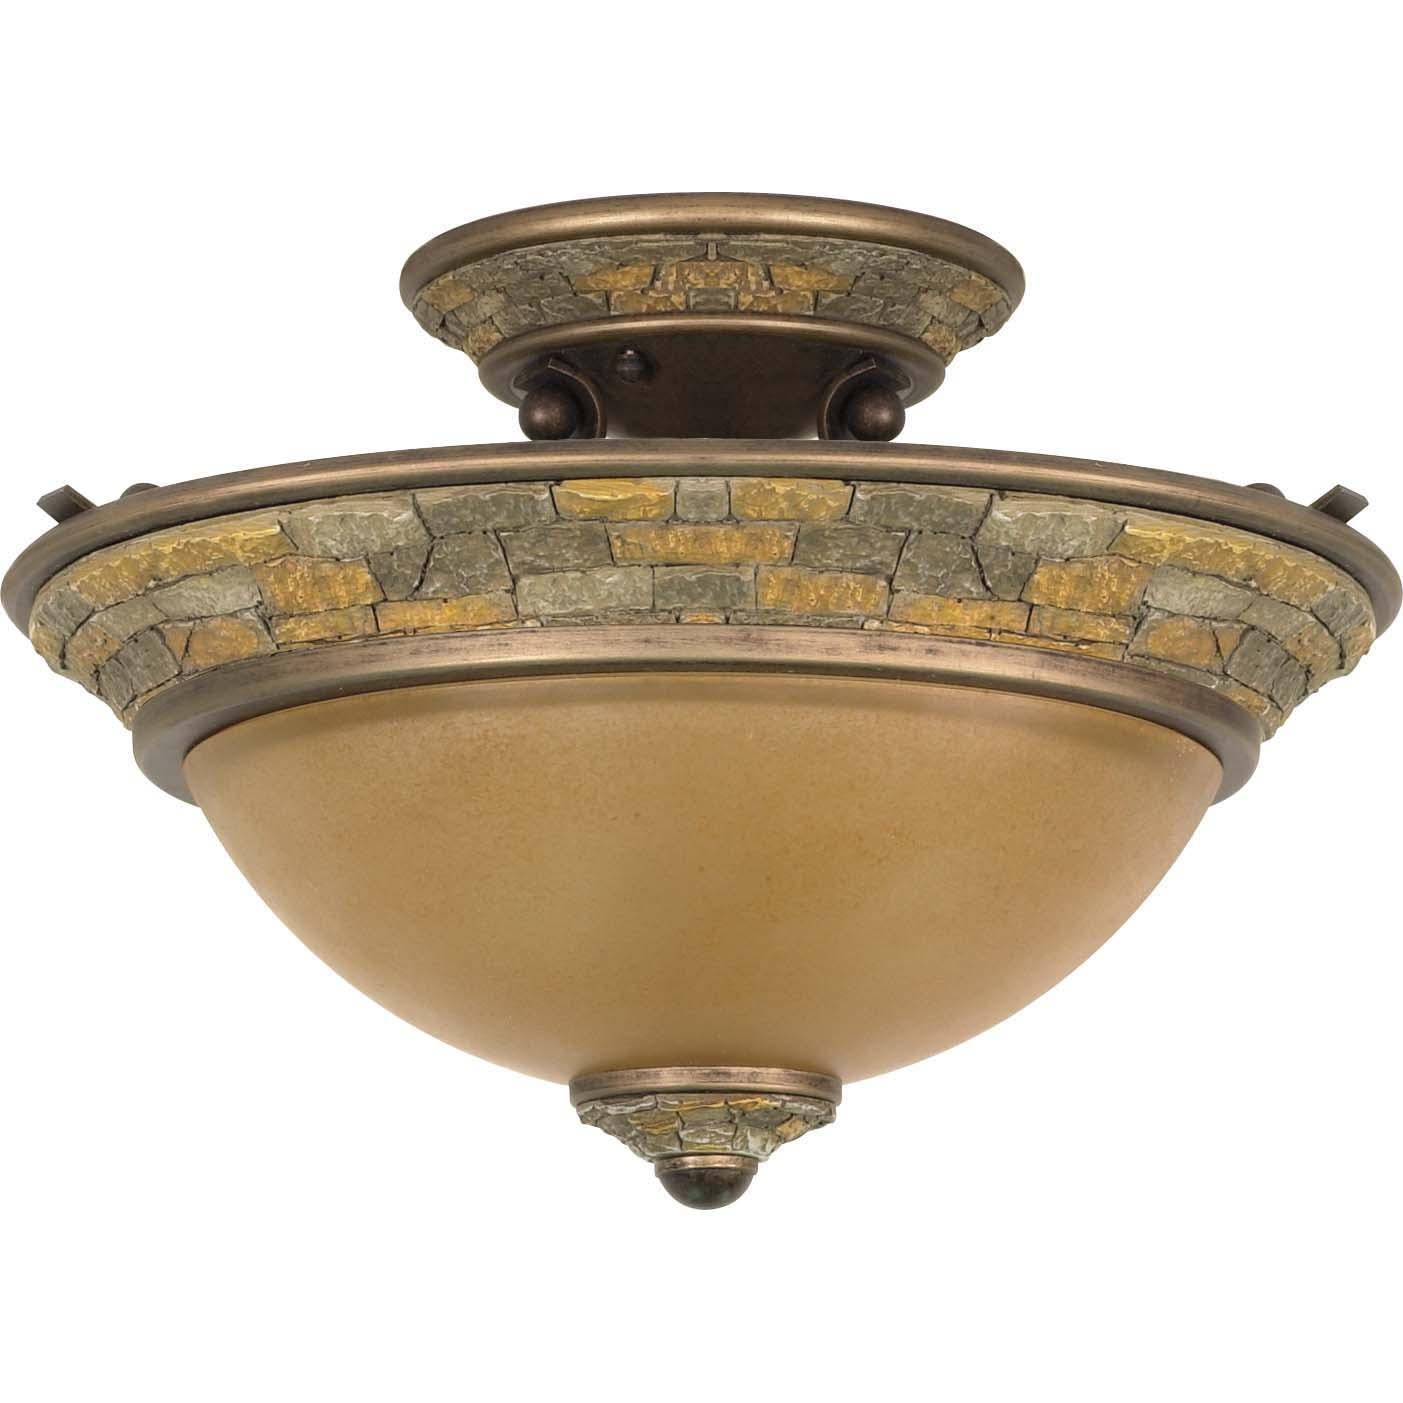 Rockport Tuscano 2-light Dorado Bronze Semi Flush Dome Light